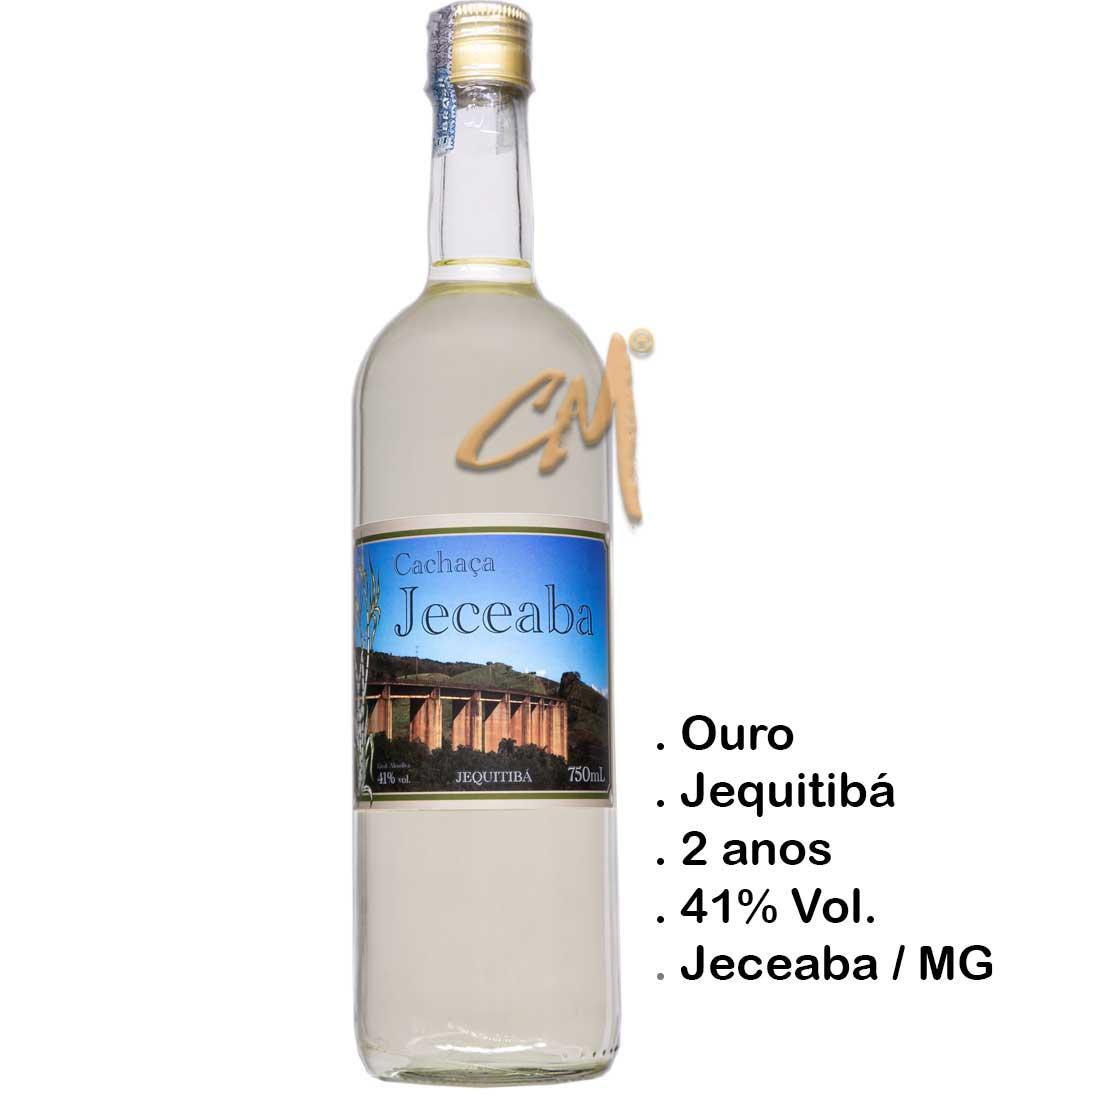 Cachaça Jeceaba 750 ml (Jeceaba - MG)